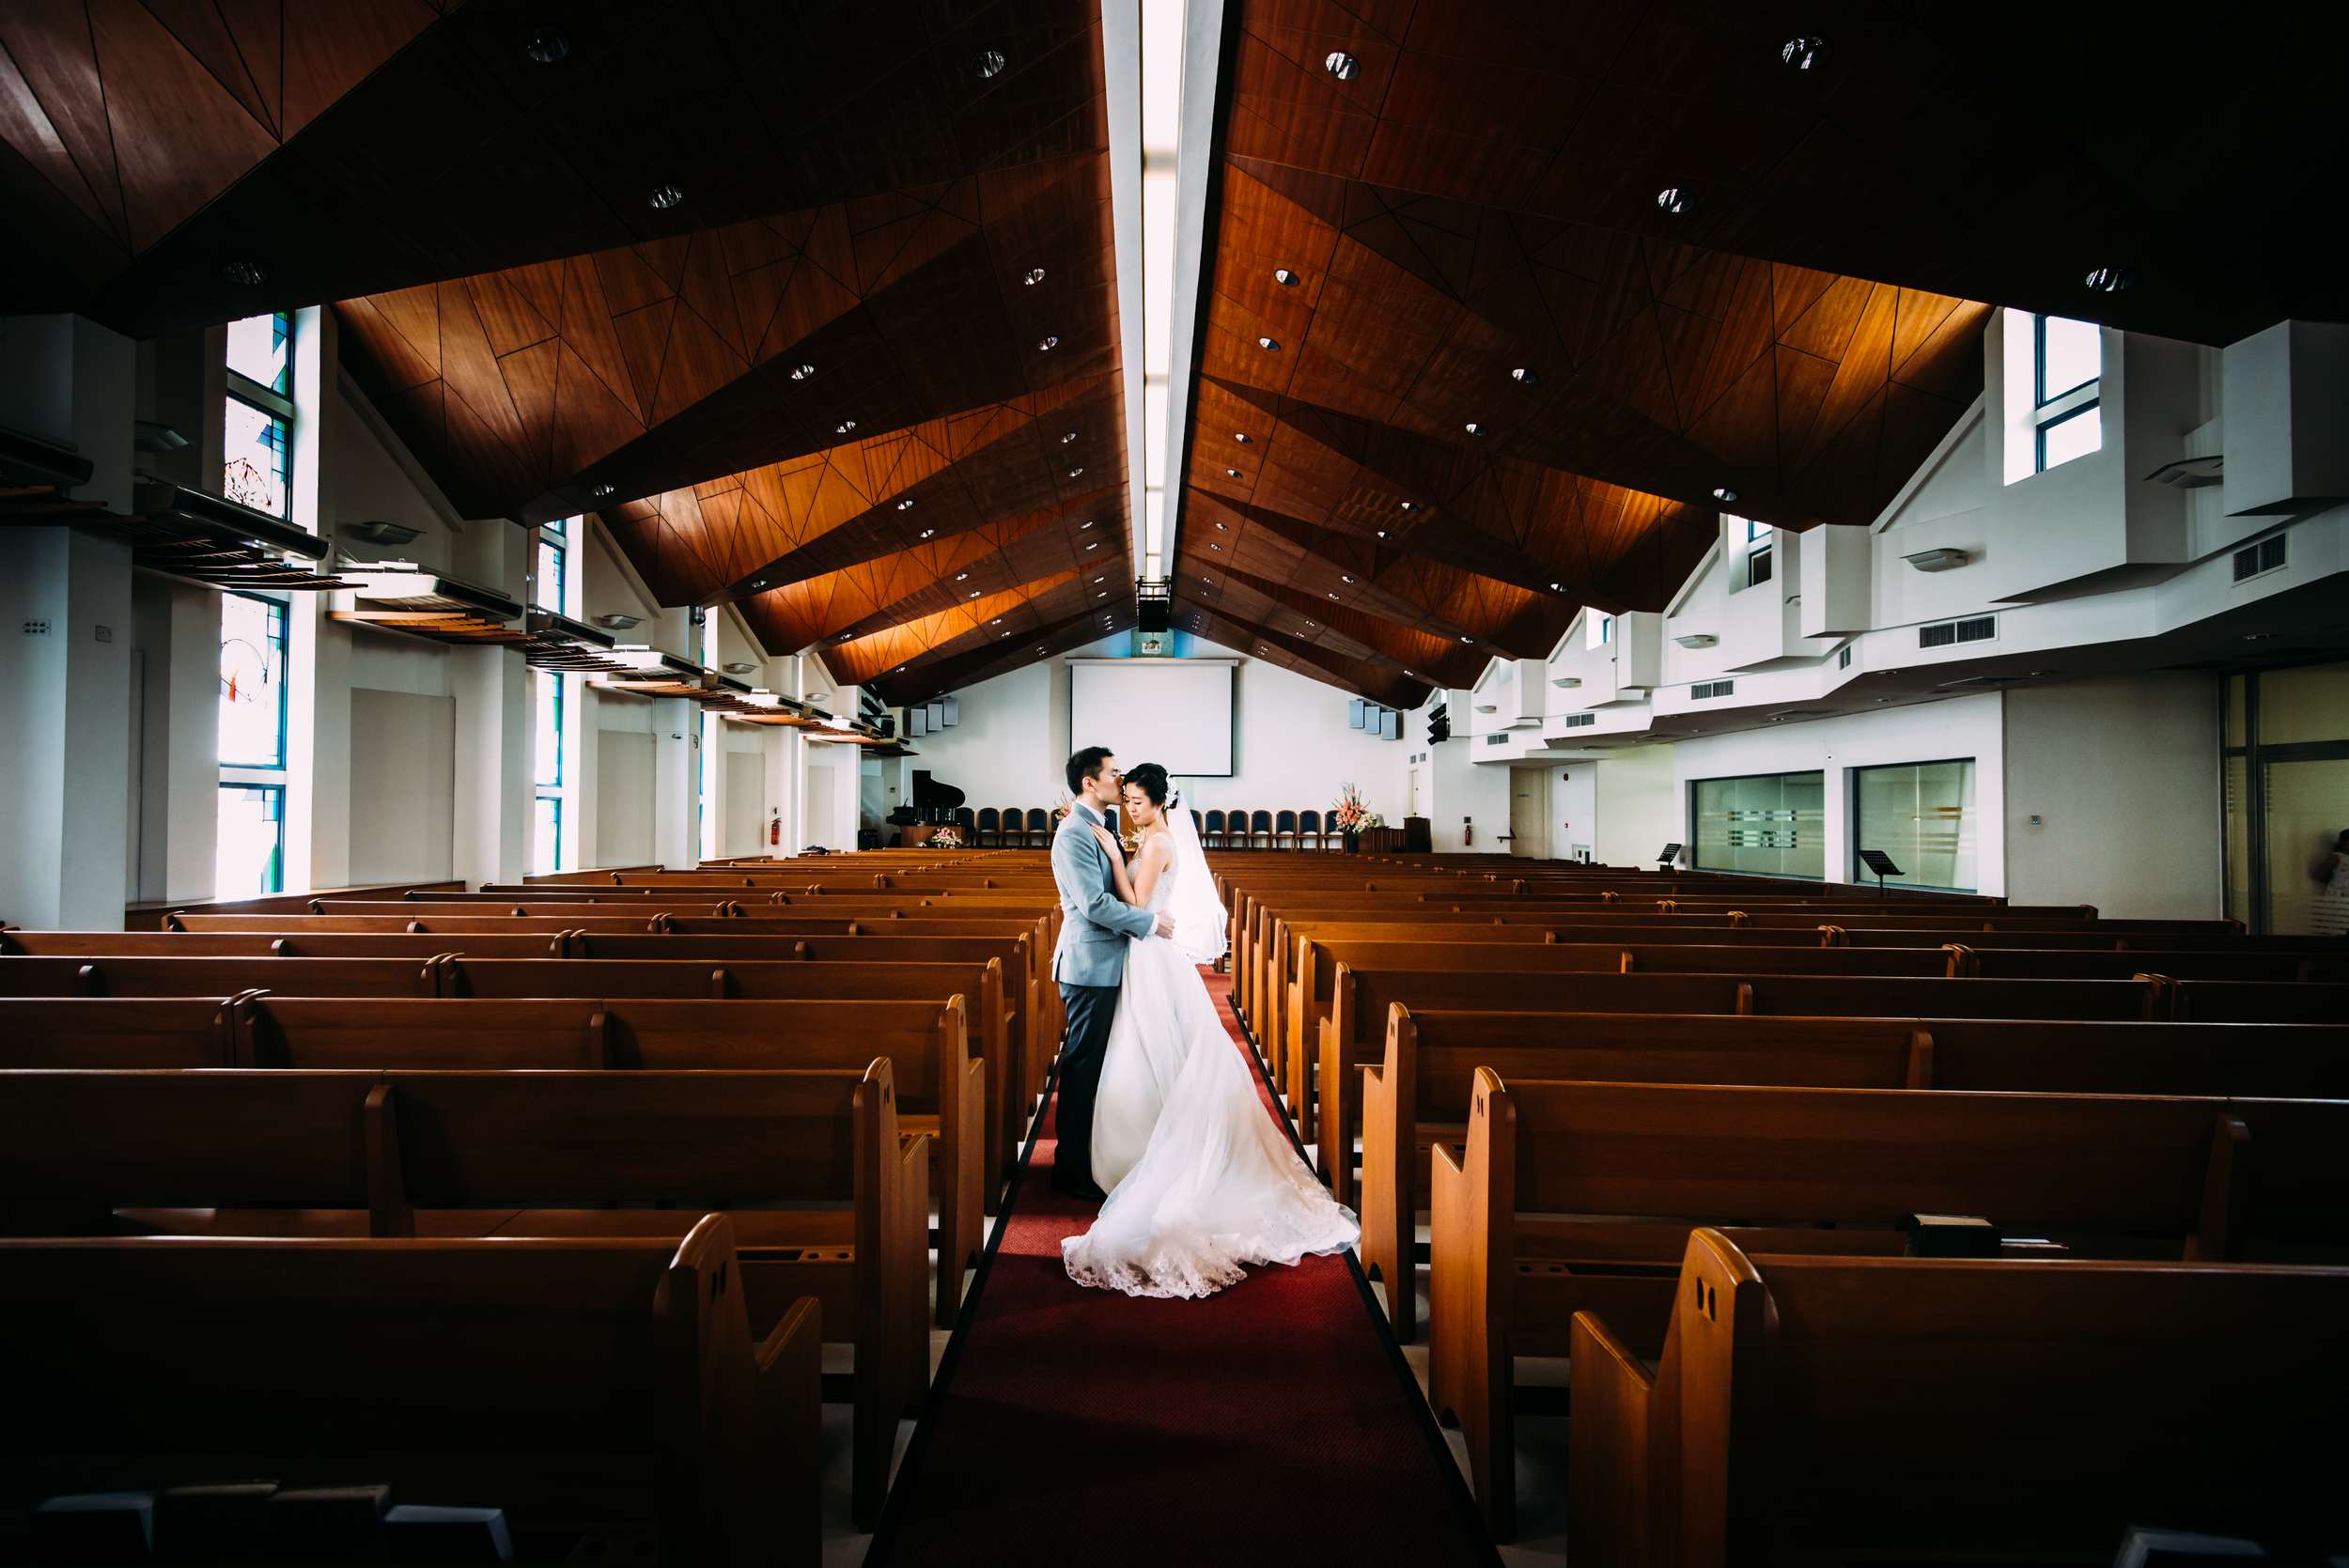 Nic and Joyce Actual Day Wedding